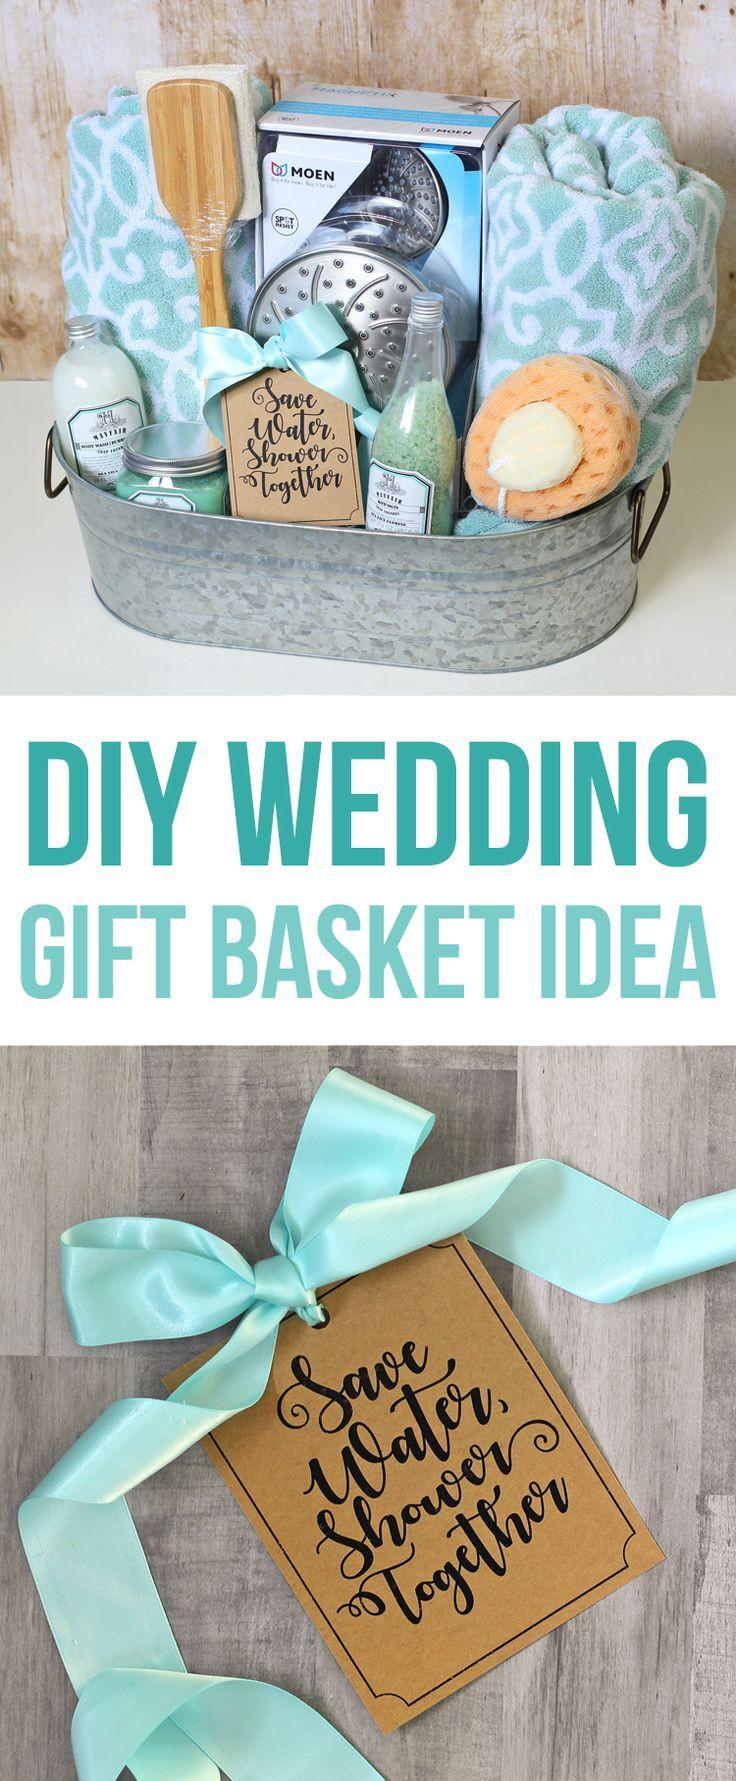 Homemade Wedding Gifts  Shower Themed DIY Wedding Gift Basket Idea